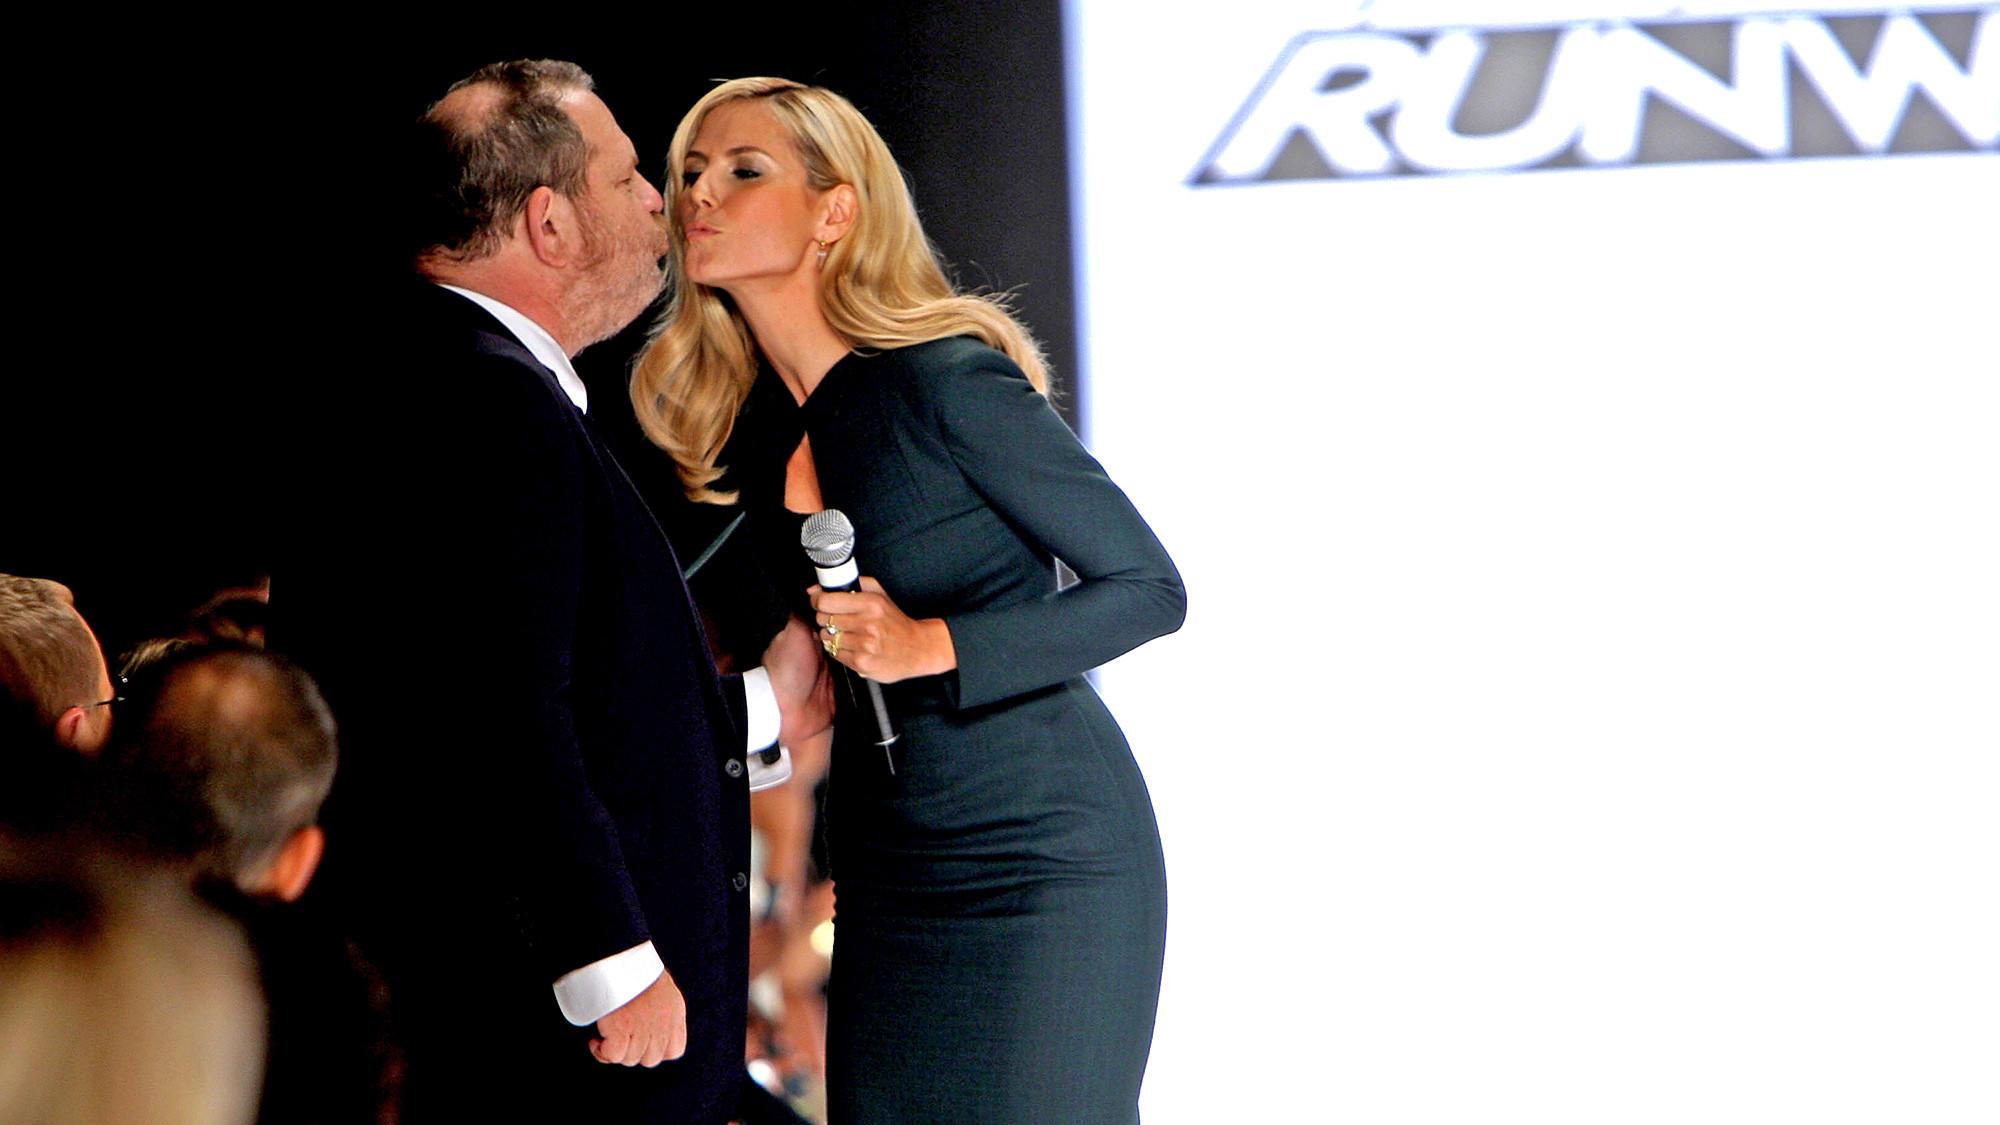 Harvey Weinstein and Heidi Klum kiss